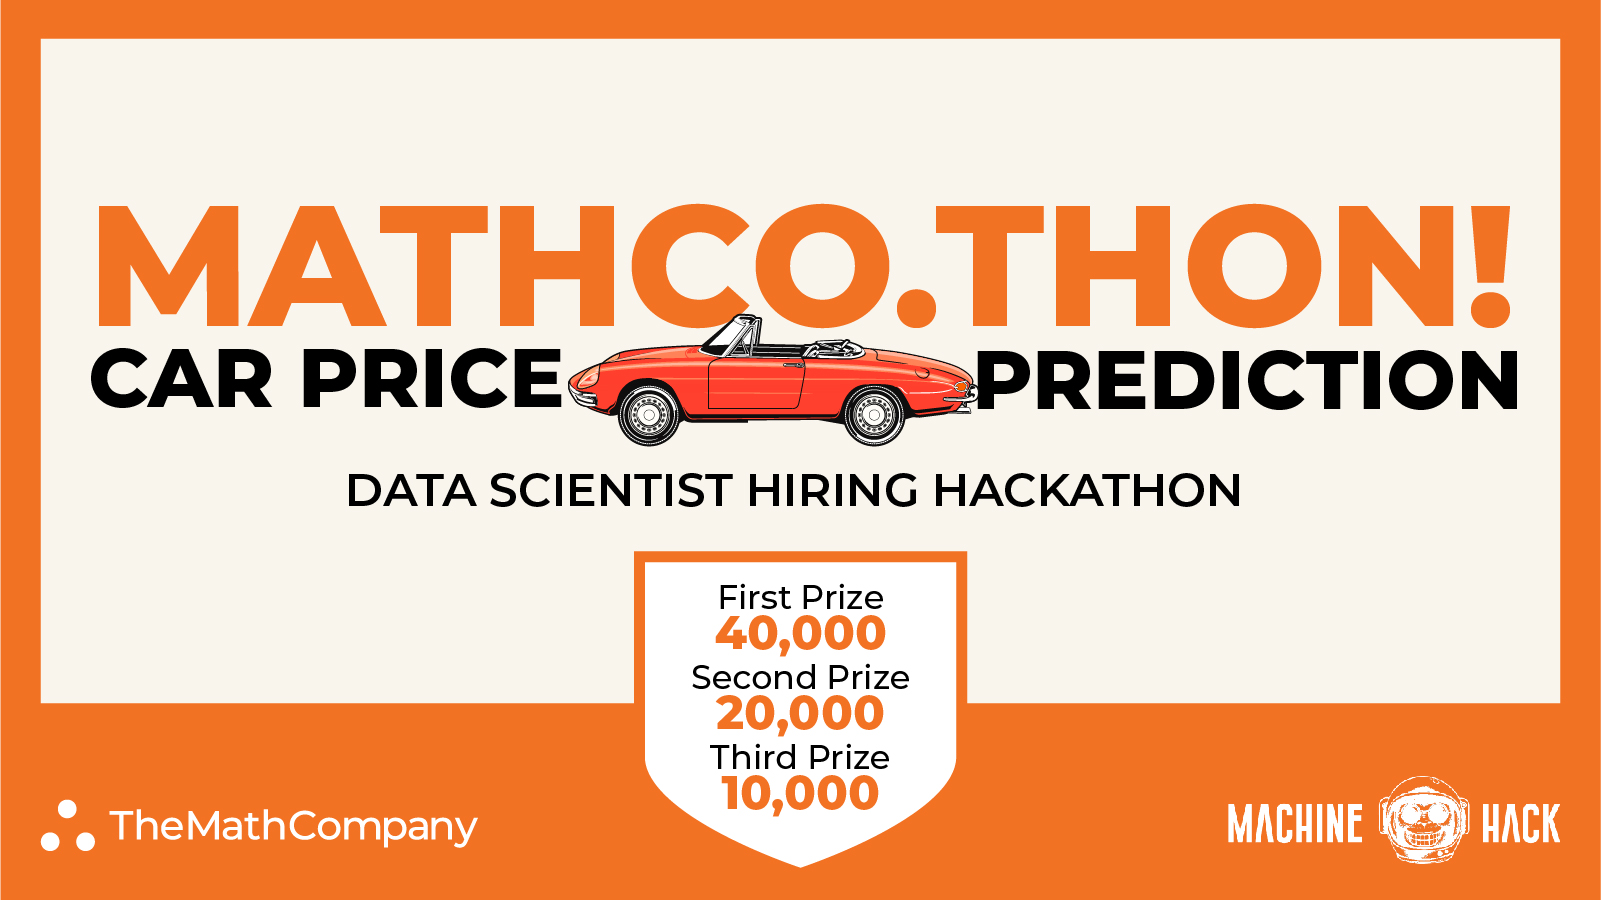 MATHCO.THON: The Data Scientist Hiring Hackathon by TheMathCompany